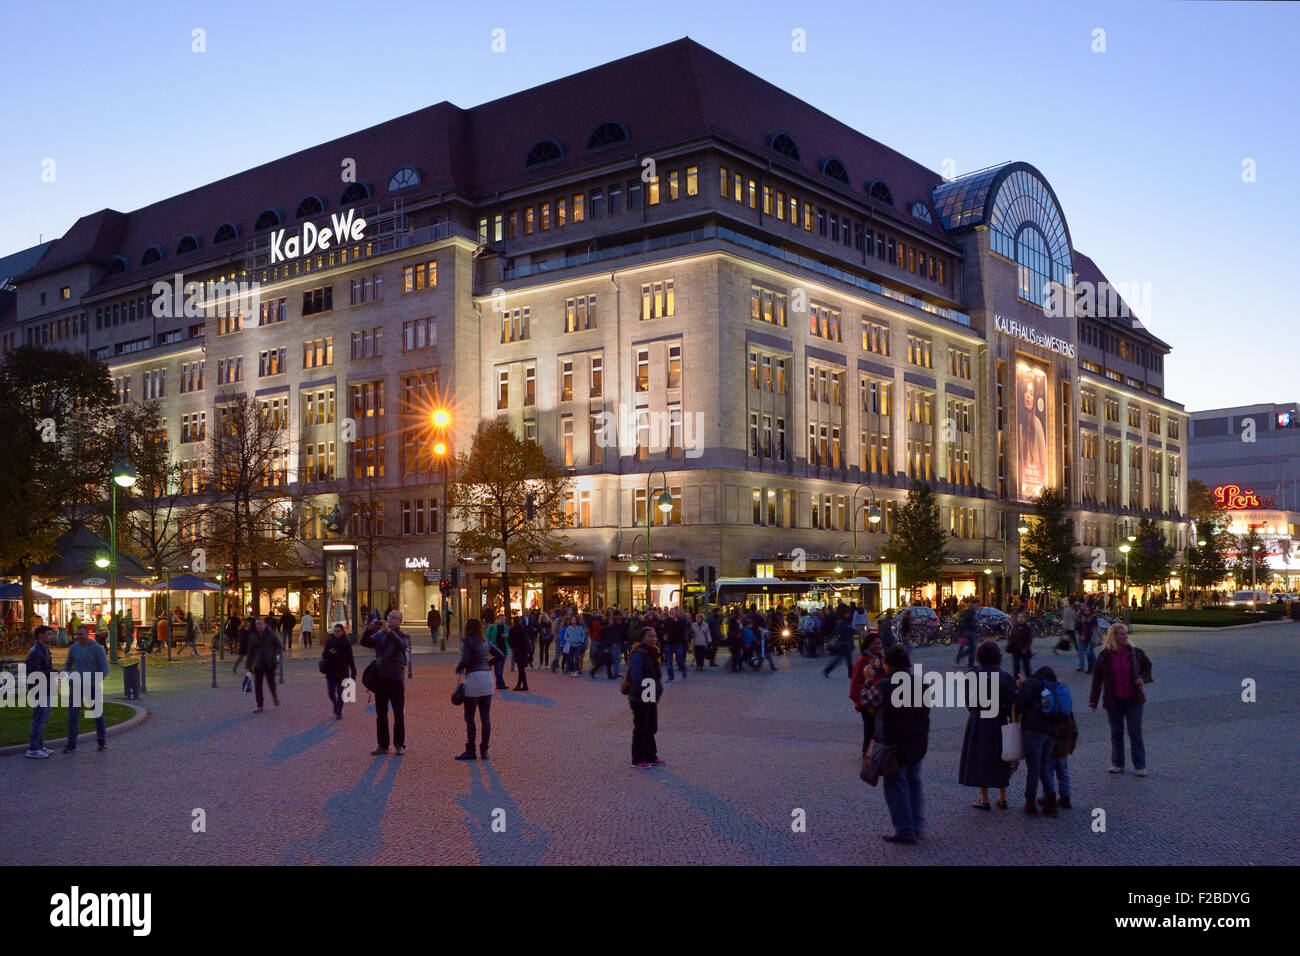 KaDeWe, Kaufhaus des Westens, Berlin's biggest department store,  Tauentzienstrasse street, Schoeneberg, Berlin - Stock Image